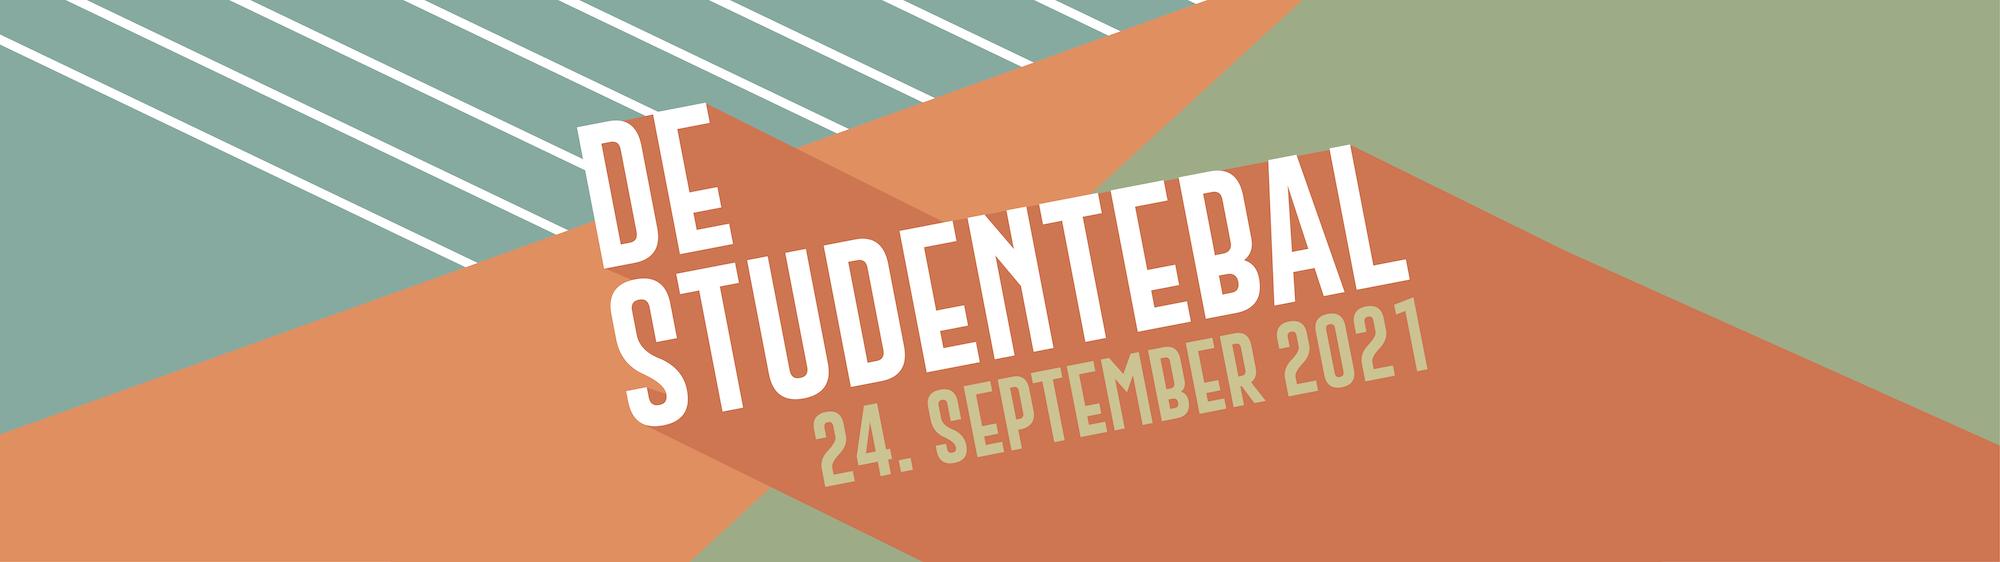 Studentebal 24.09.21